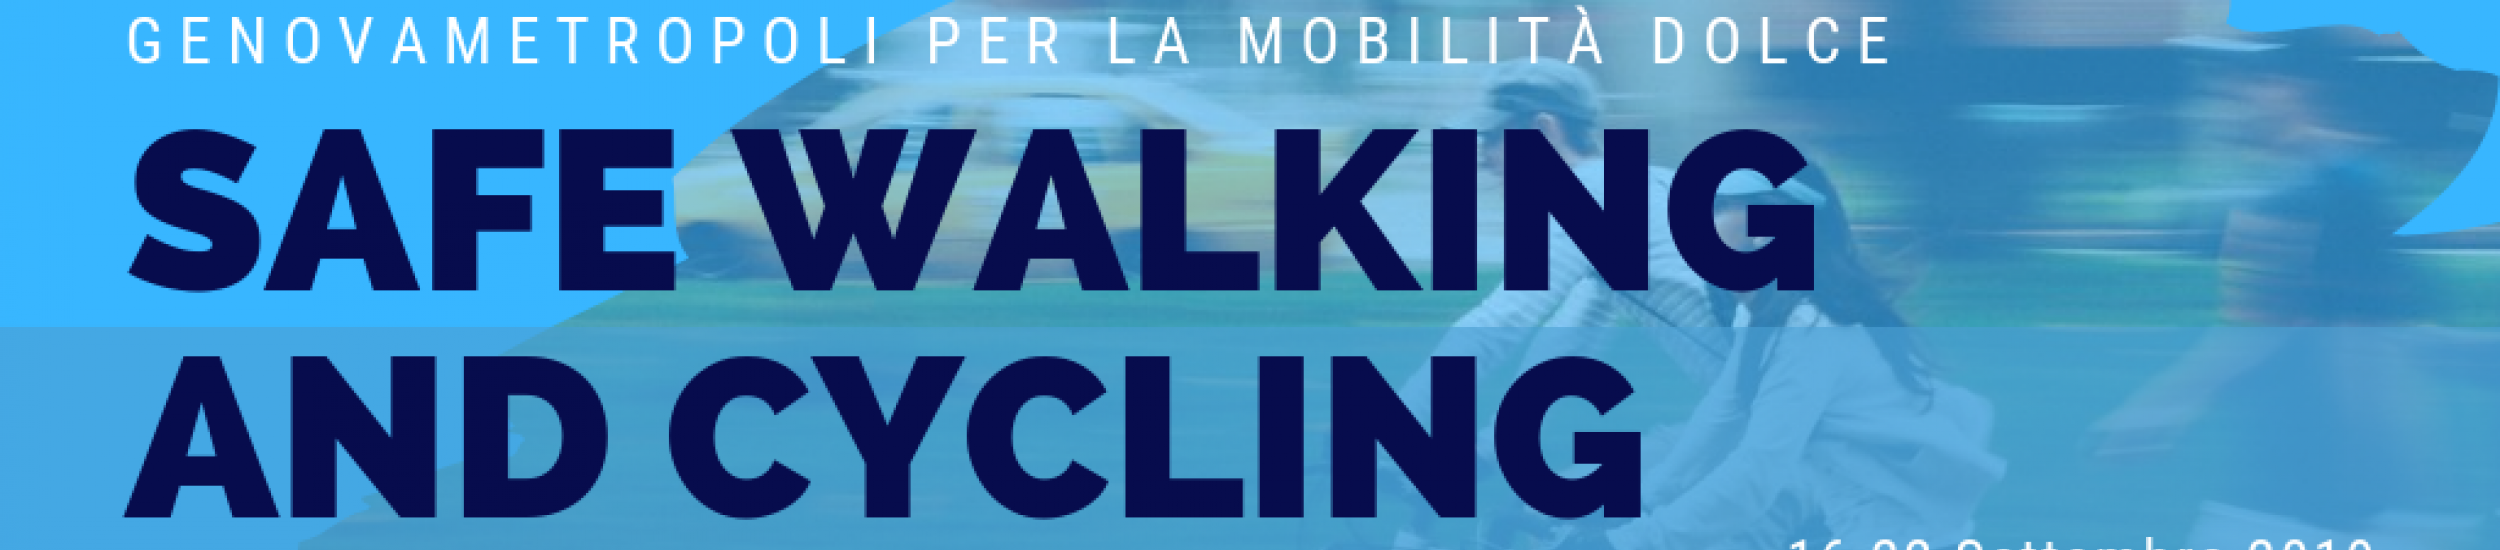 Genovametropoli e la Mobilità dolce